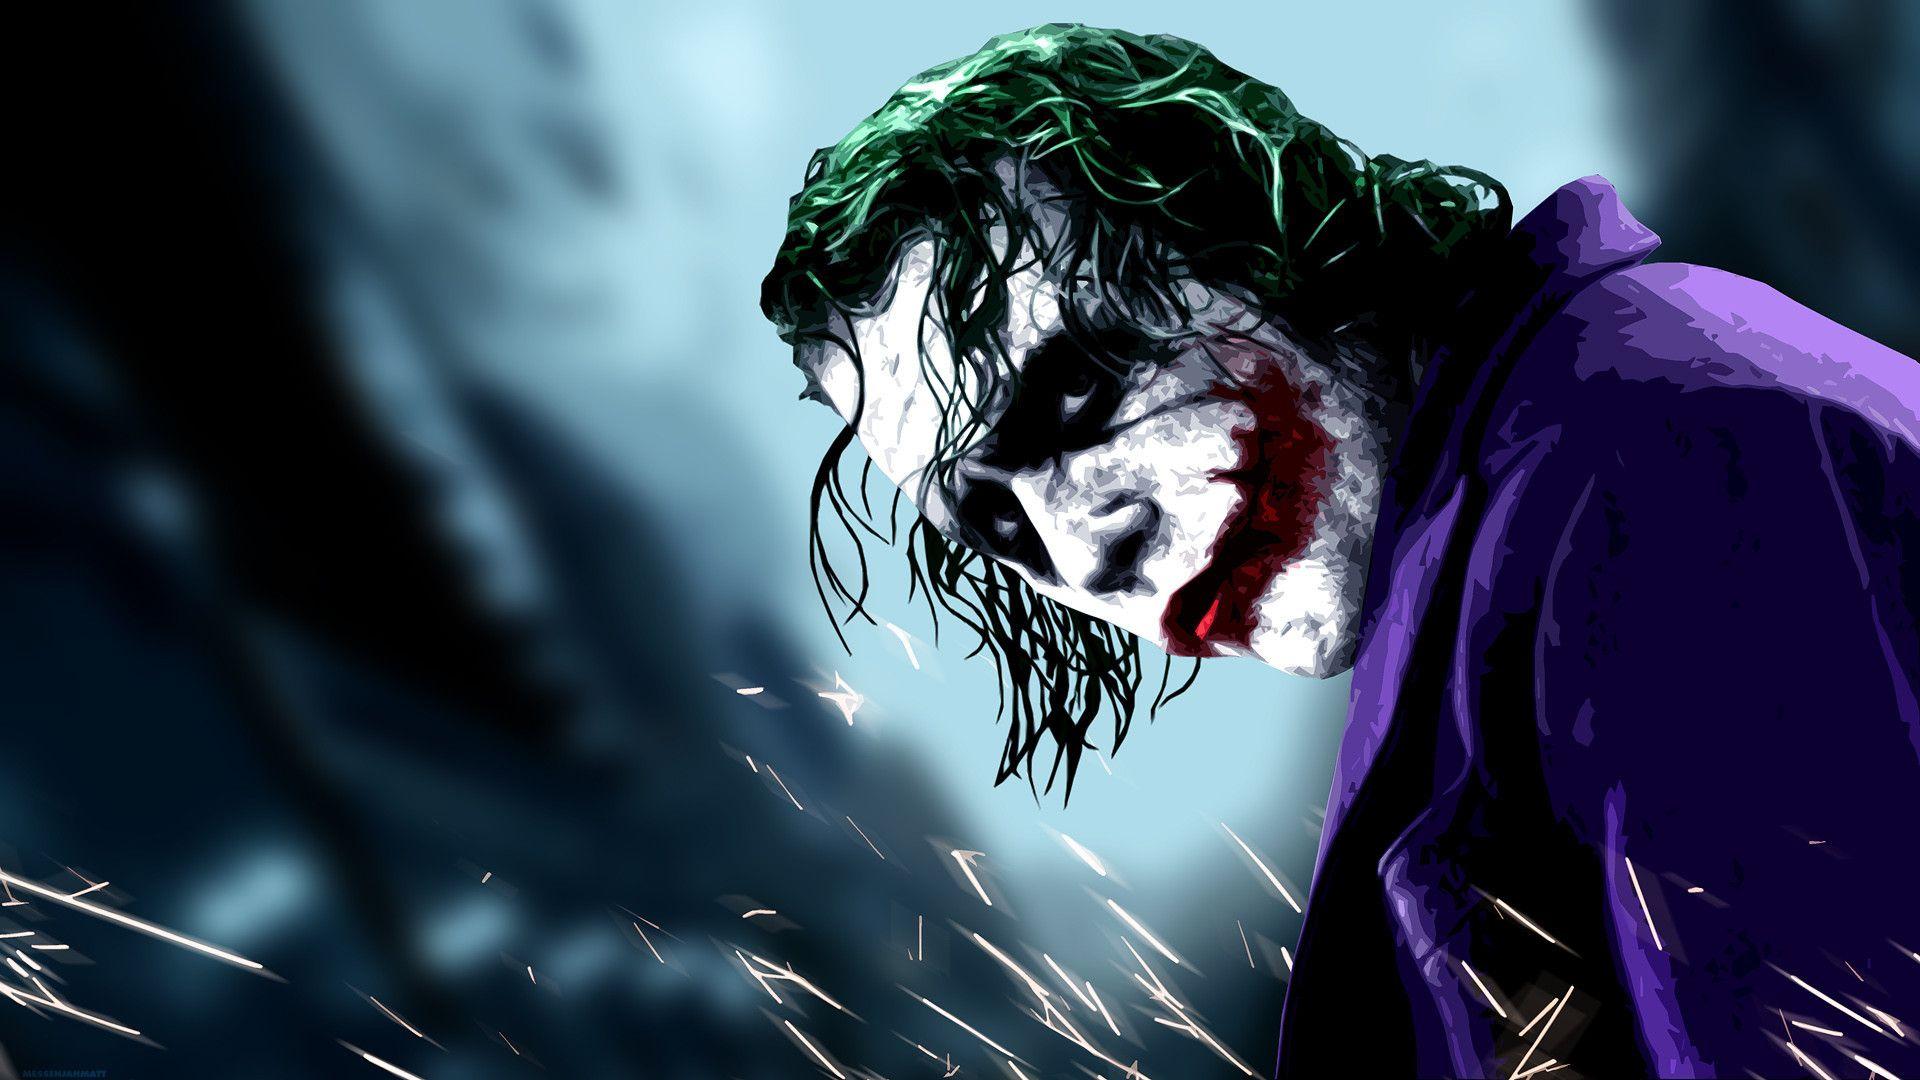 78 Evil Joker Wallpapers On Wallpaperplay Imagenes Del Guason Heath Ledger Joker Arte De Chisisto